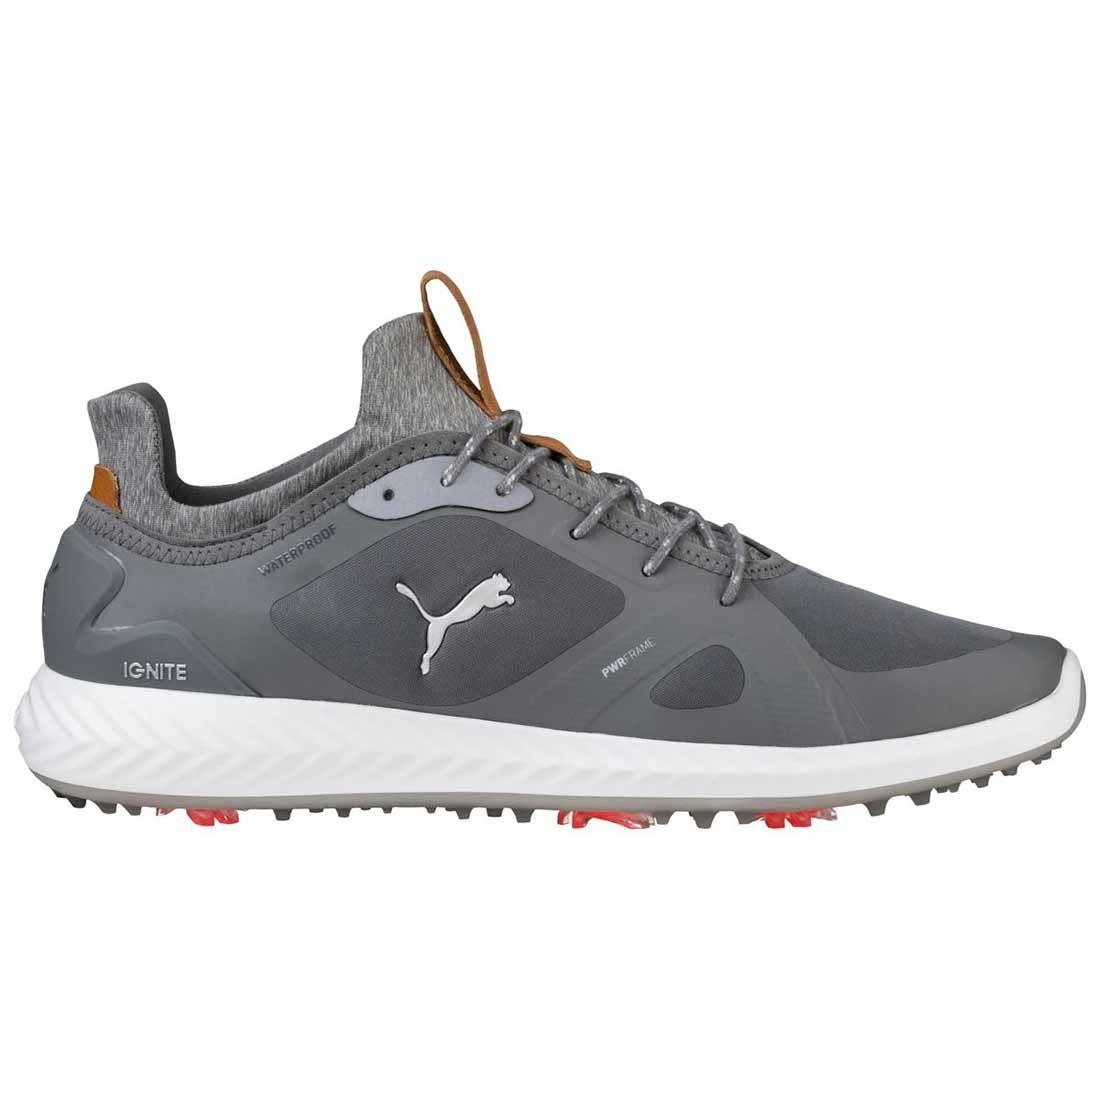 Buy Puma Ignite Pwradapt Golf Shoes Quiet Shade Golf Discount